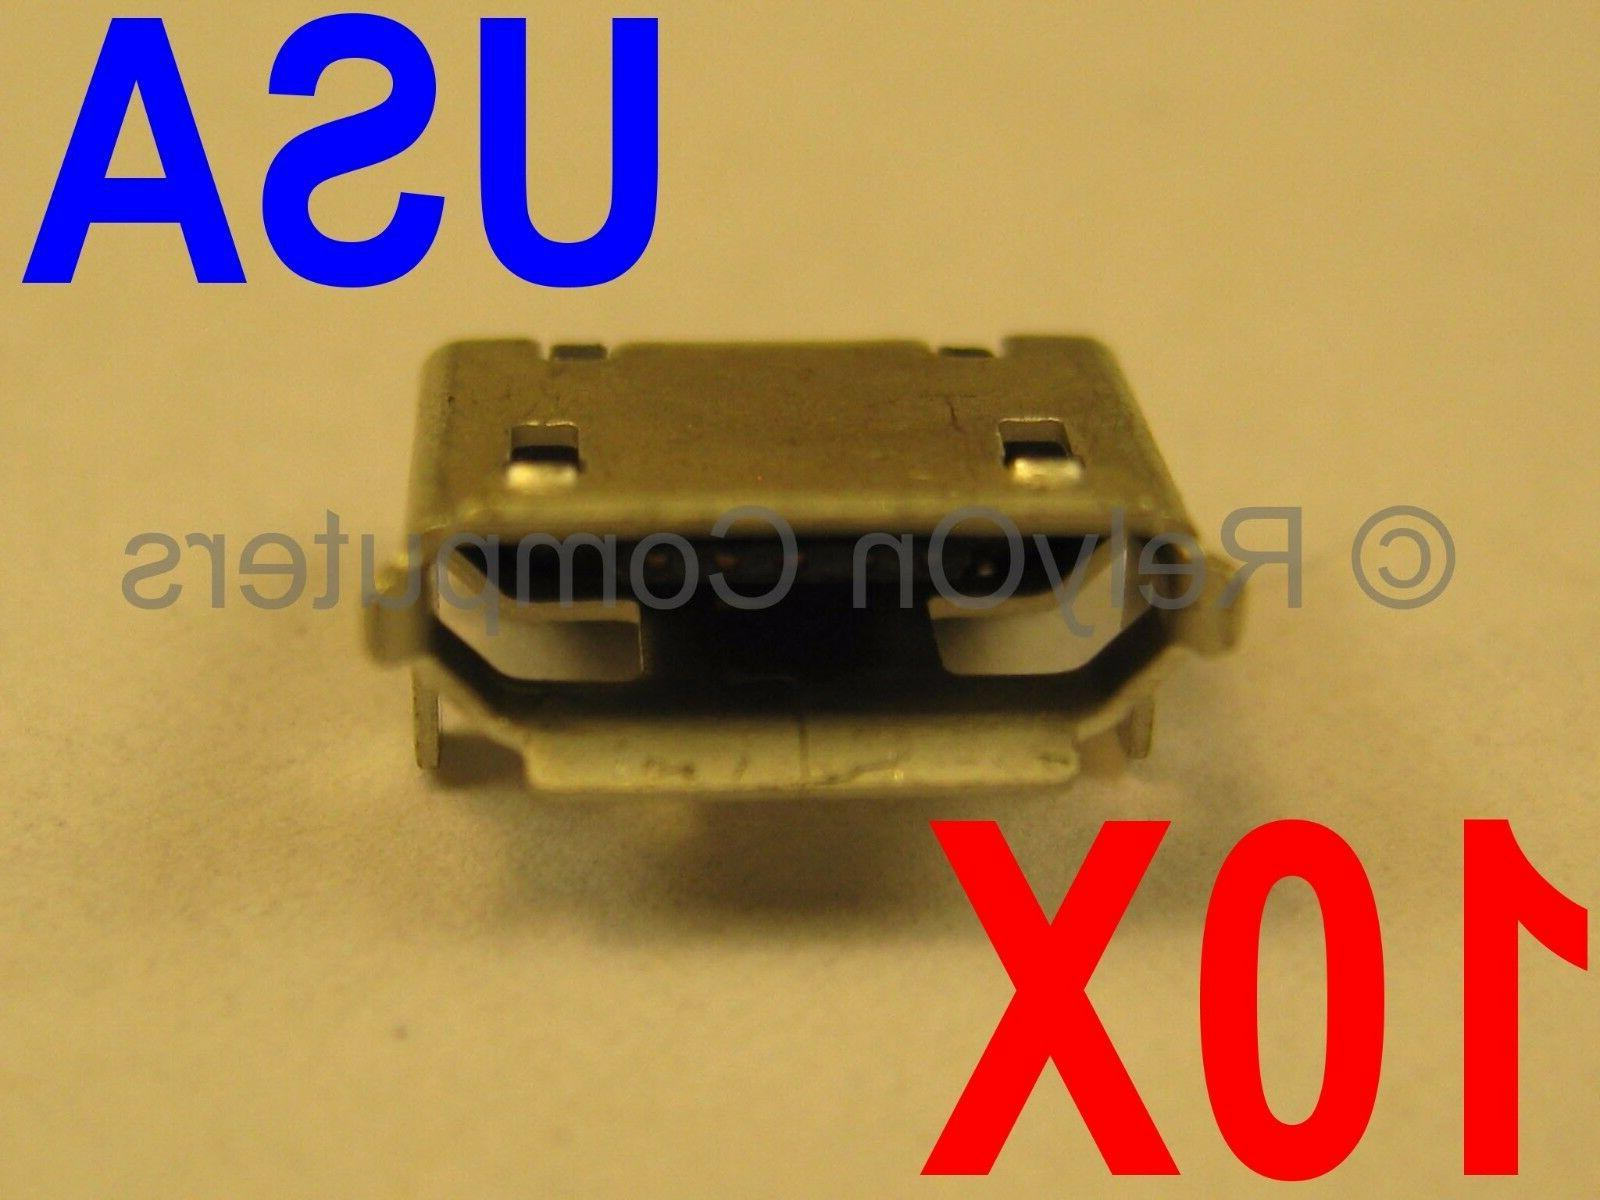 10x lot of micro usb charging port